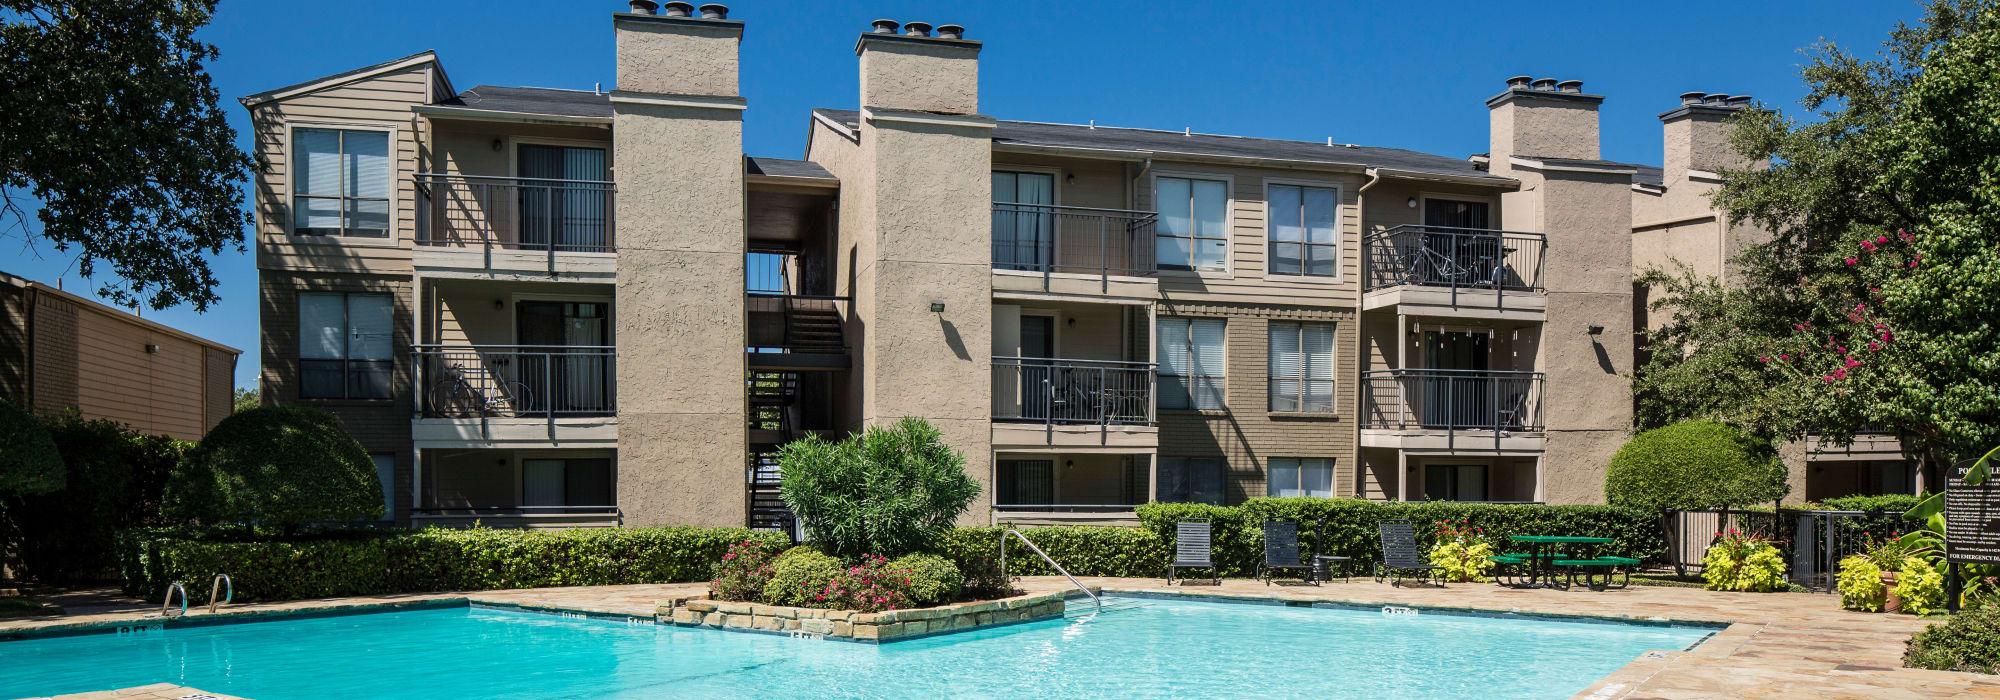 Apartments in Arlington, TX